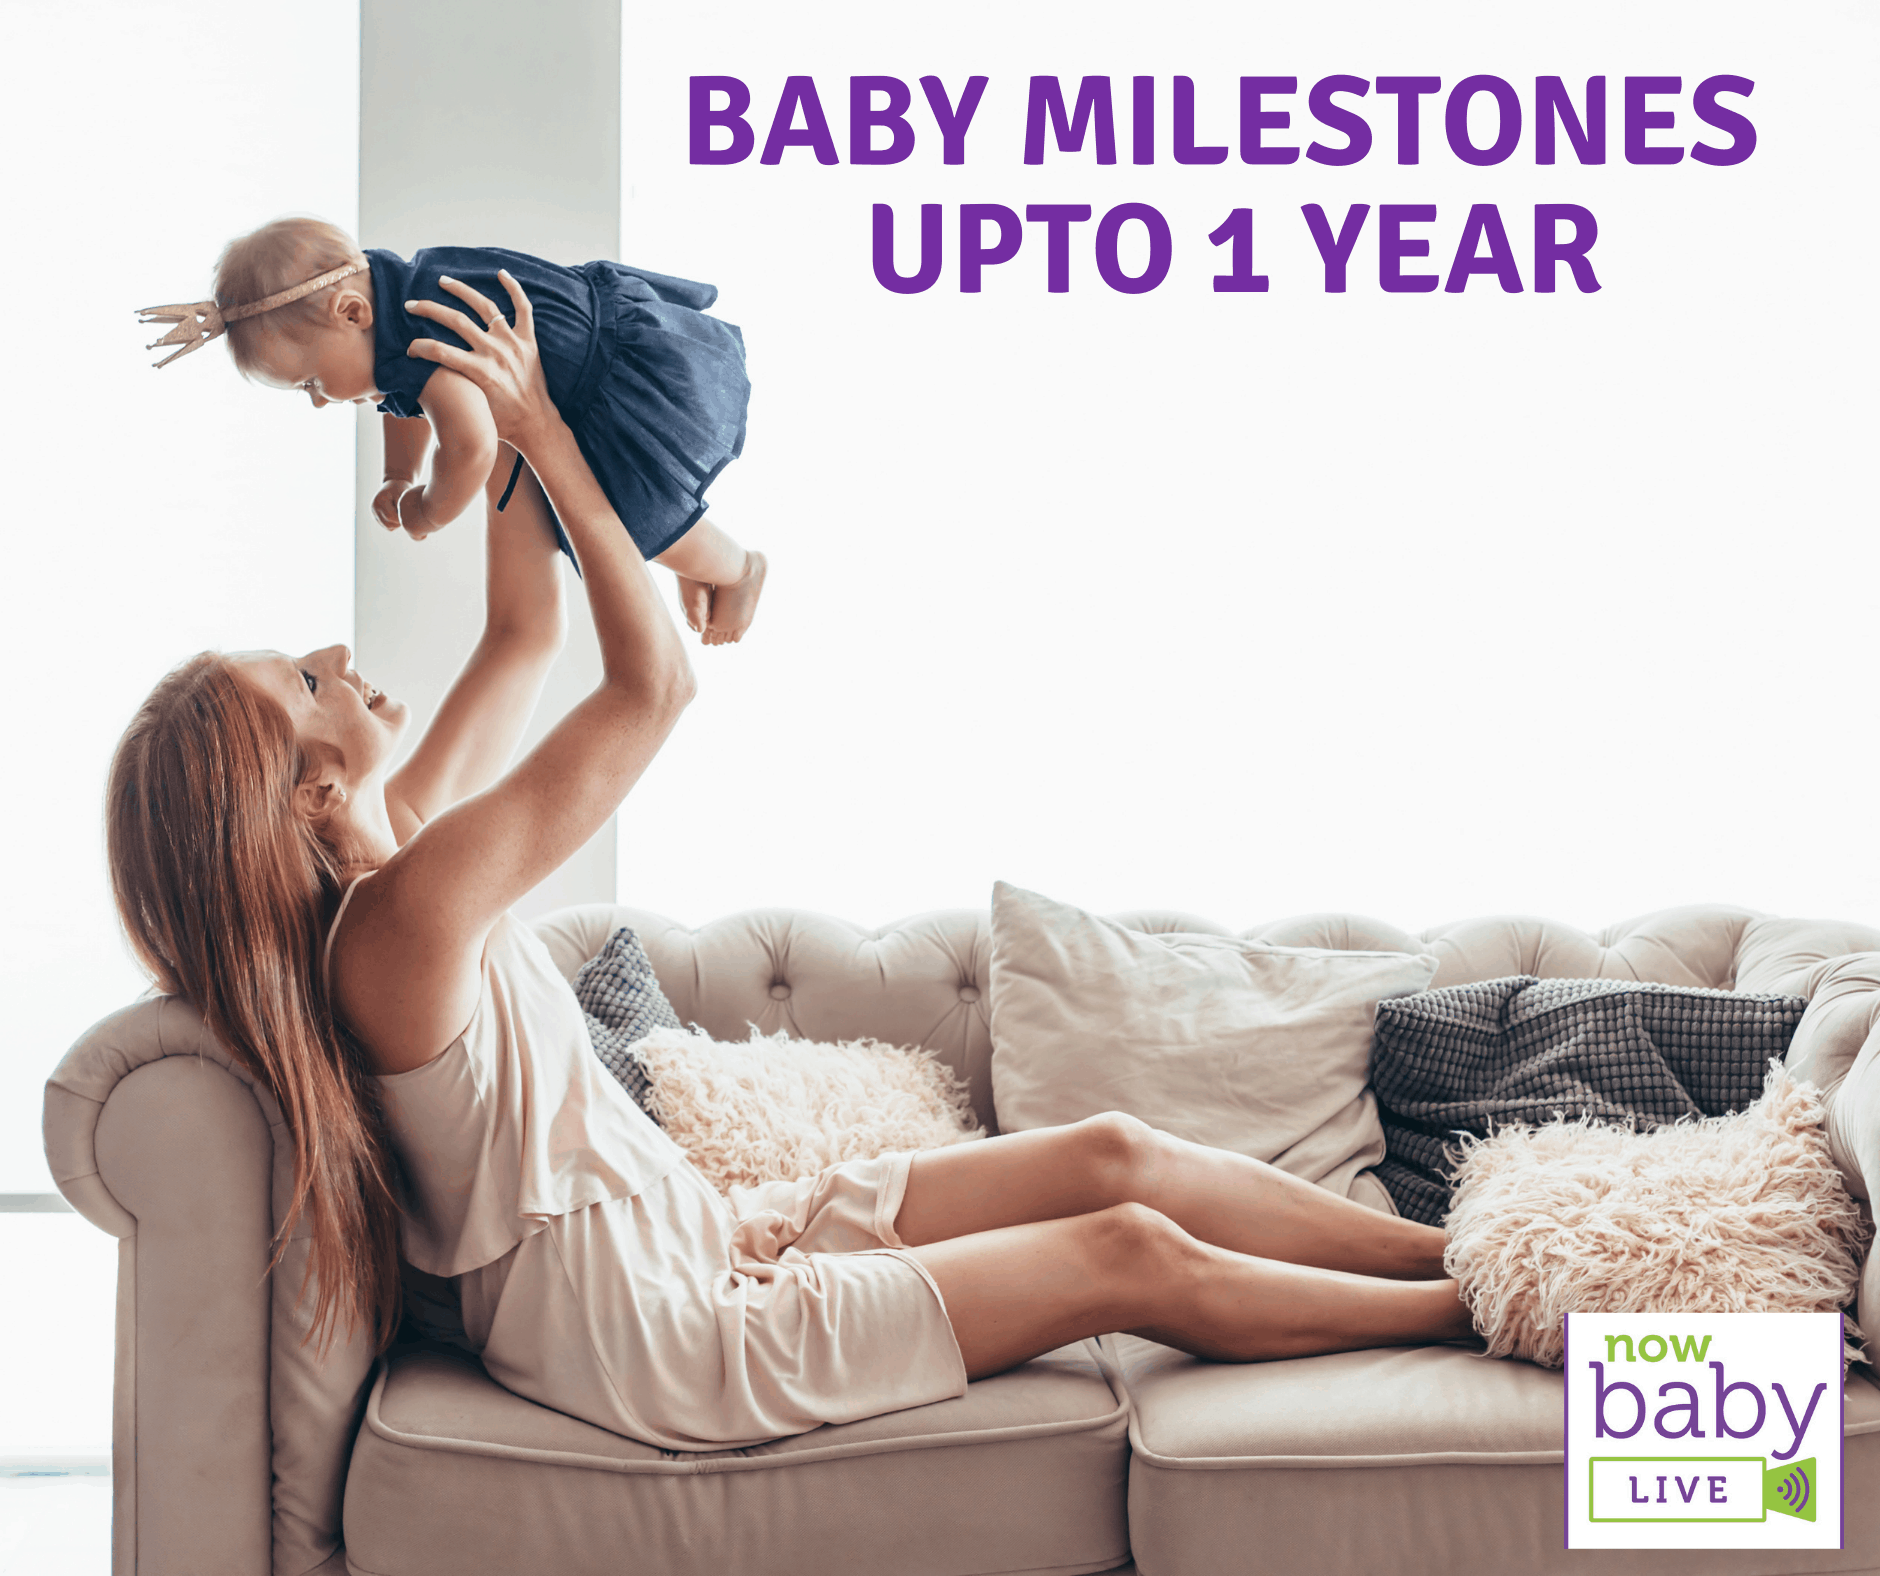 Baby Milestones Up To 1 year